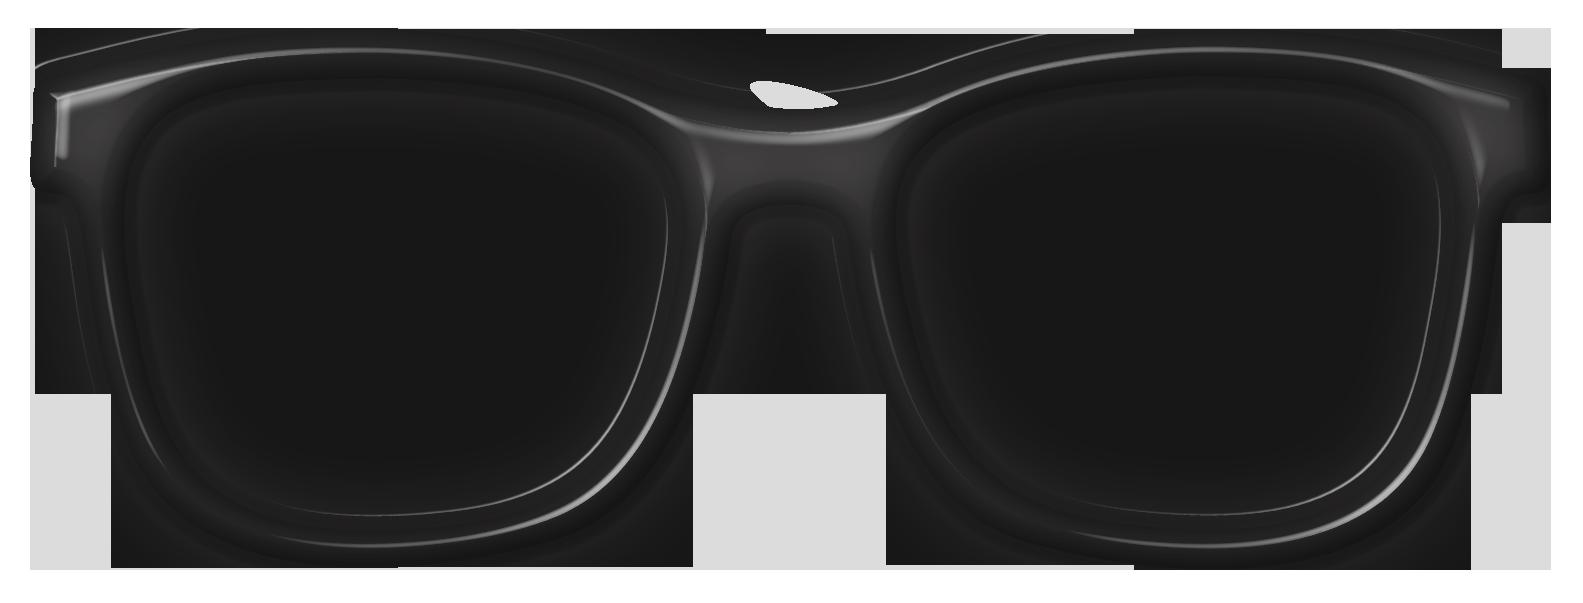 Glasses Transparent Background Glasses Png Image Hipster Glasses Glasses Buddy Holly Glasses